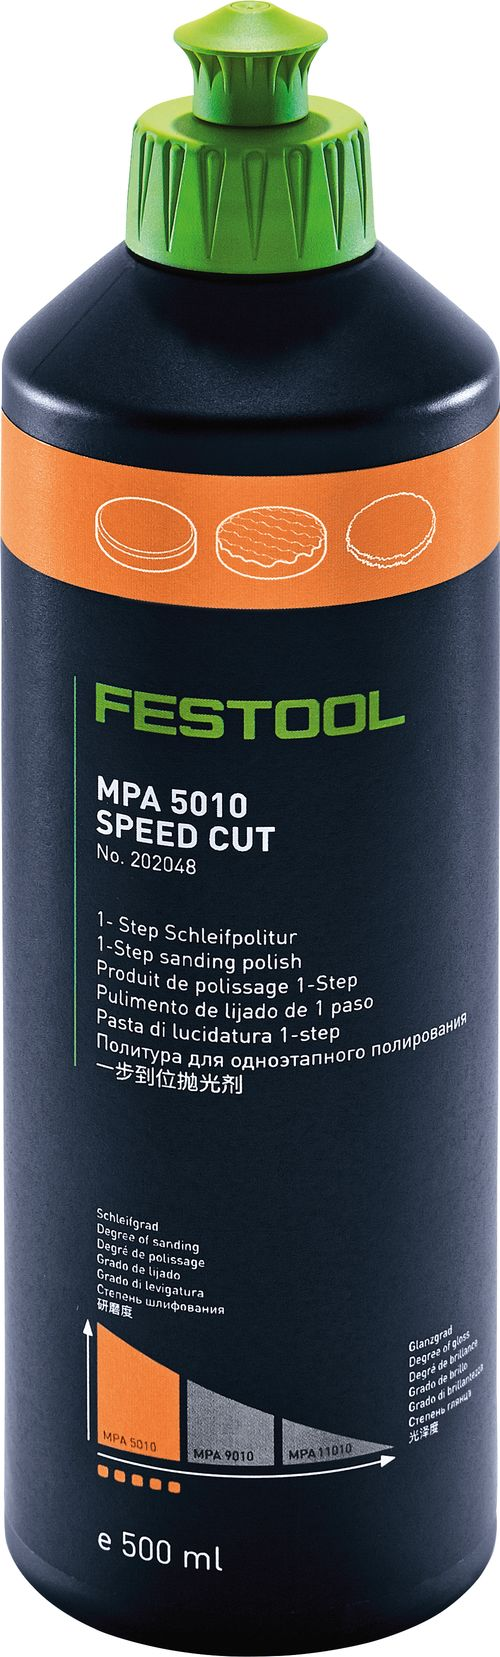 Festool Produto para polimento MPA 5010 OR/0,5L